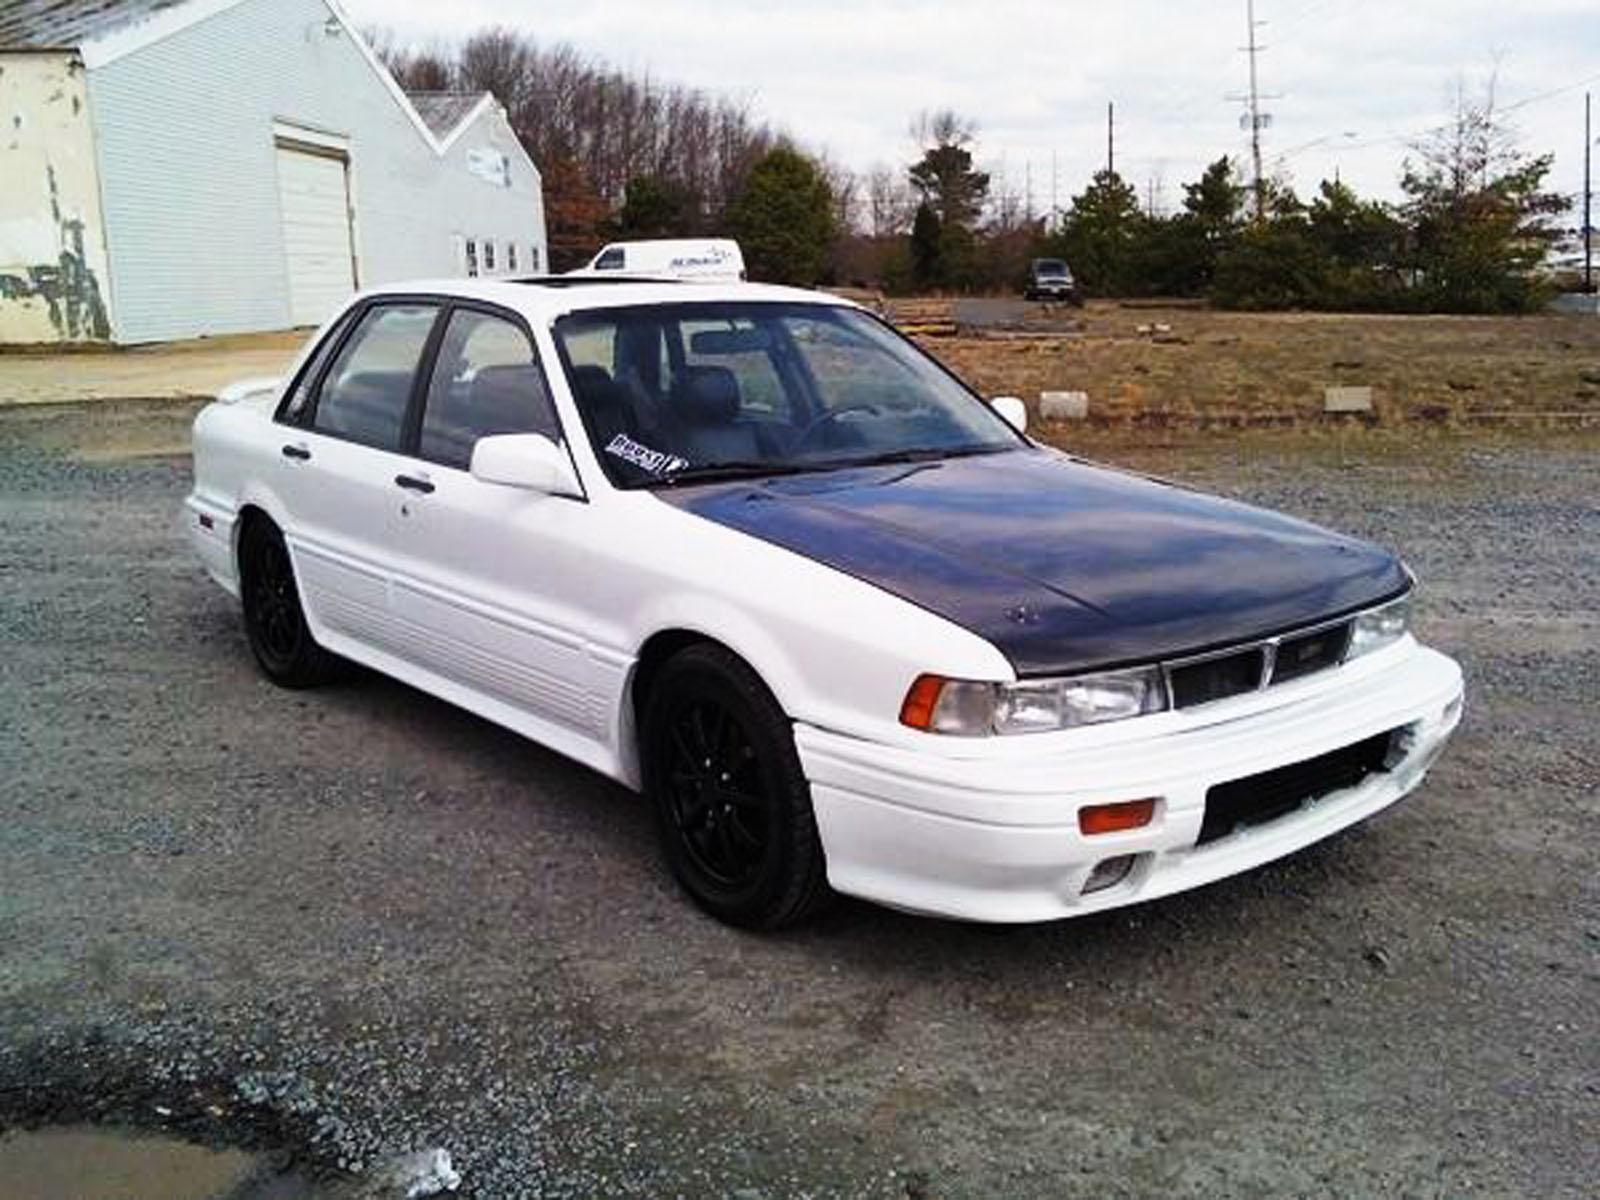 1991 Mitsubishi Galant Vr 4 Galant Vr 4 For Sale Brick New Jersey